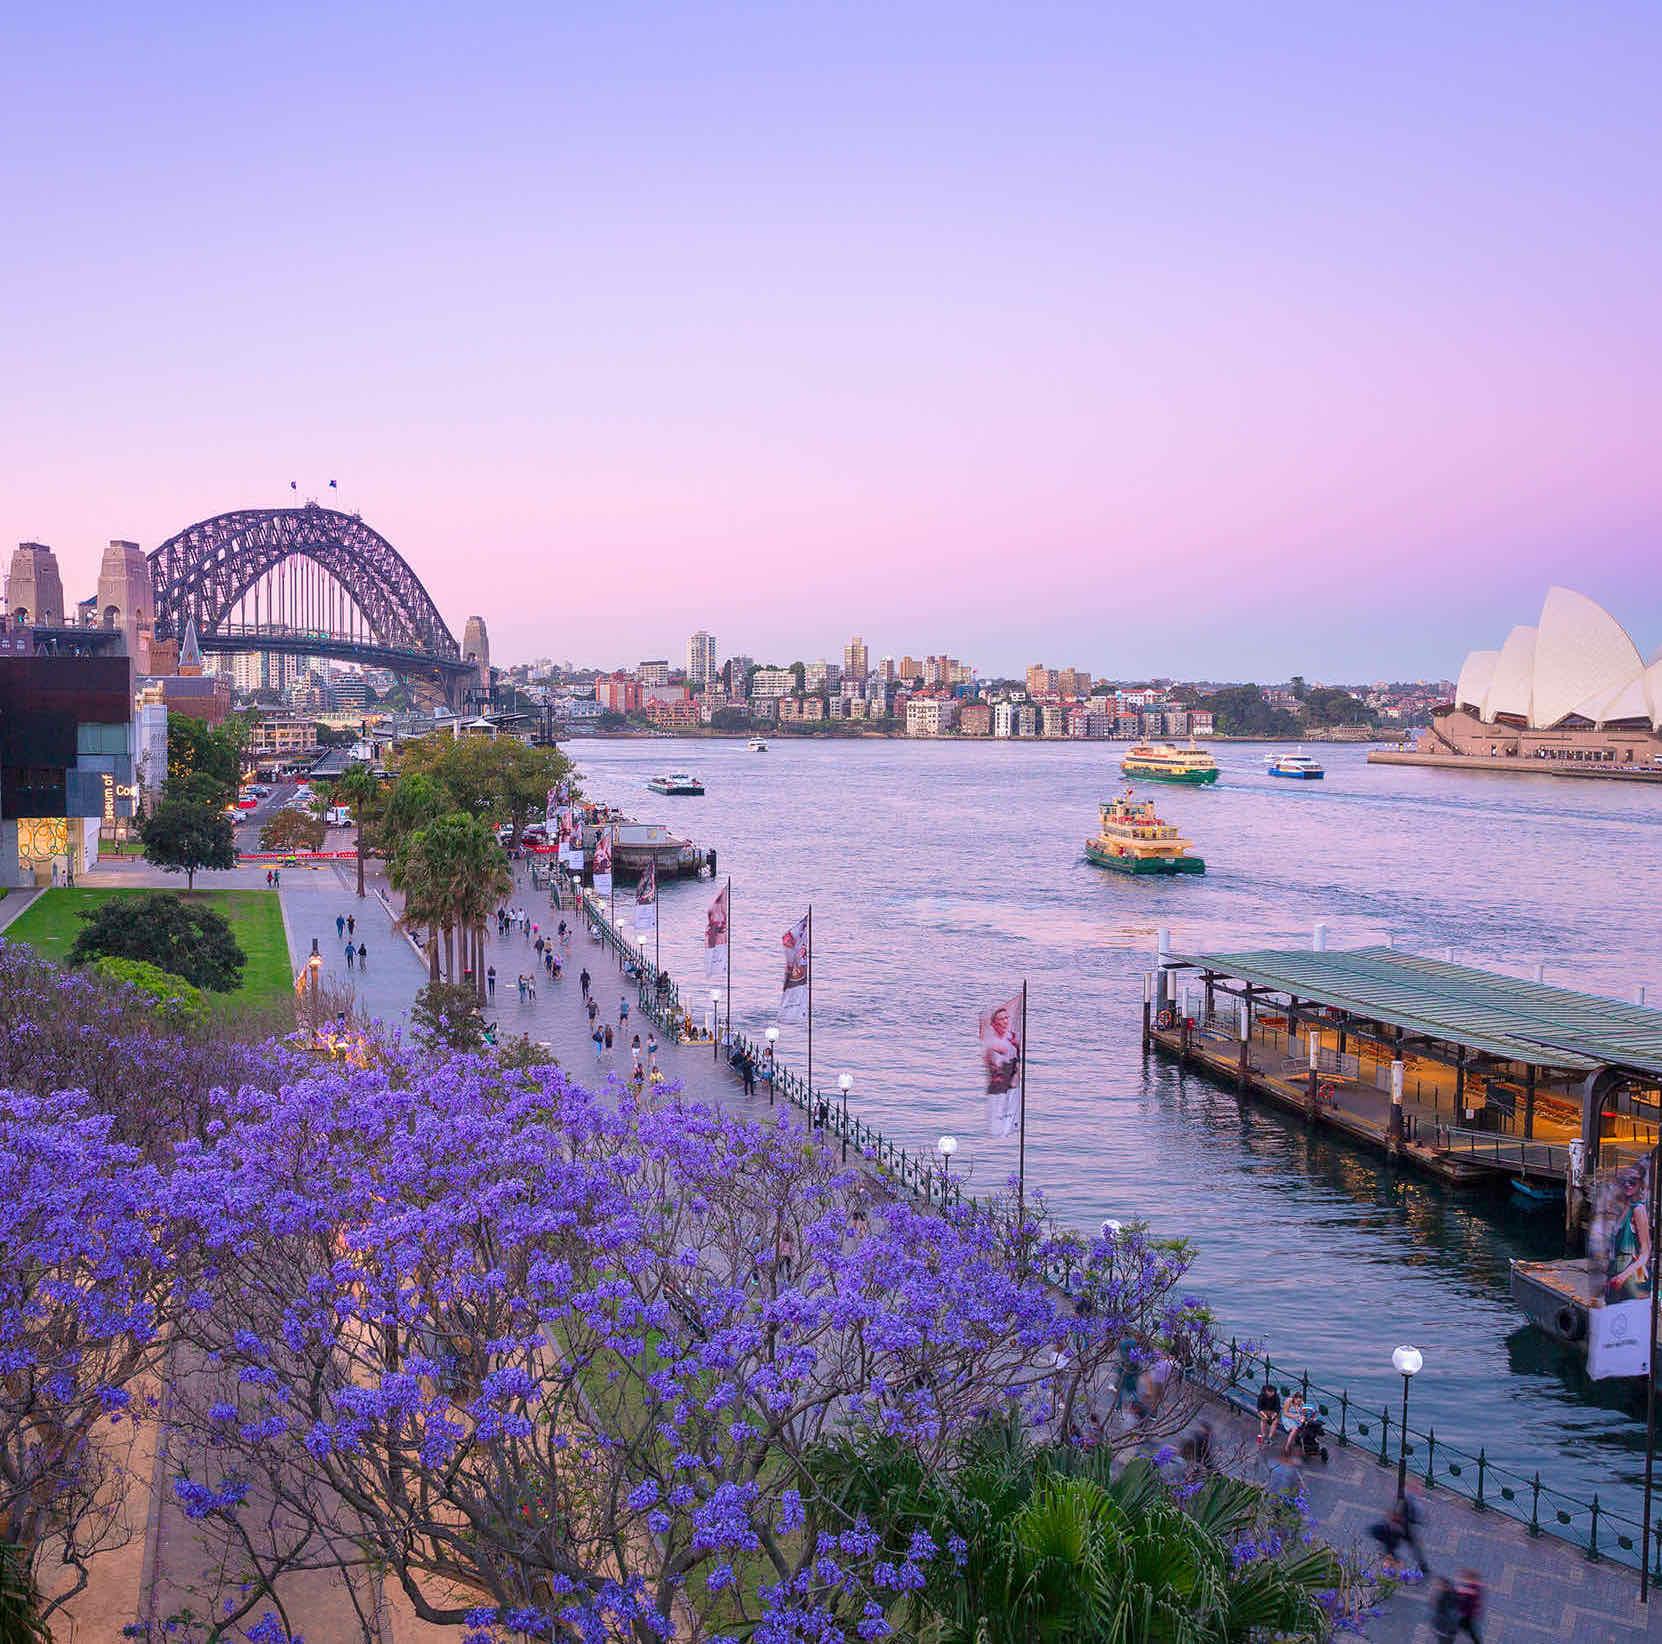 sq-sydney-rocks-harbour-bridge-MCA-opera-house-destinationNSW-photo-credit